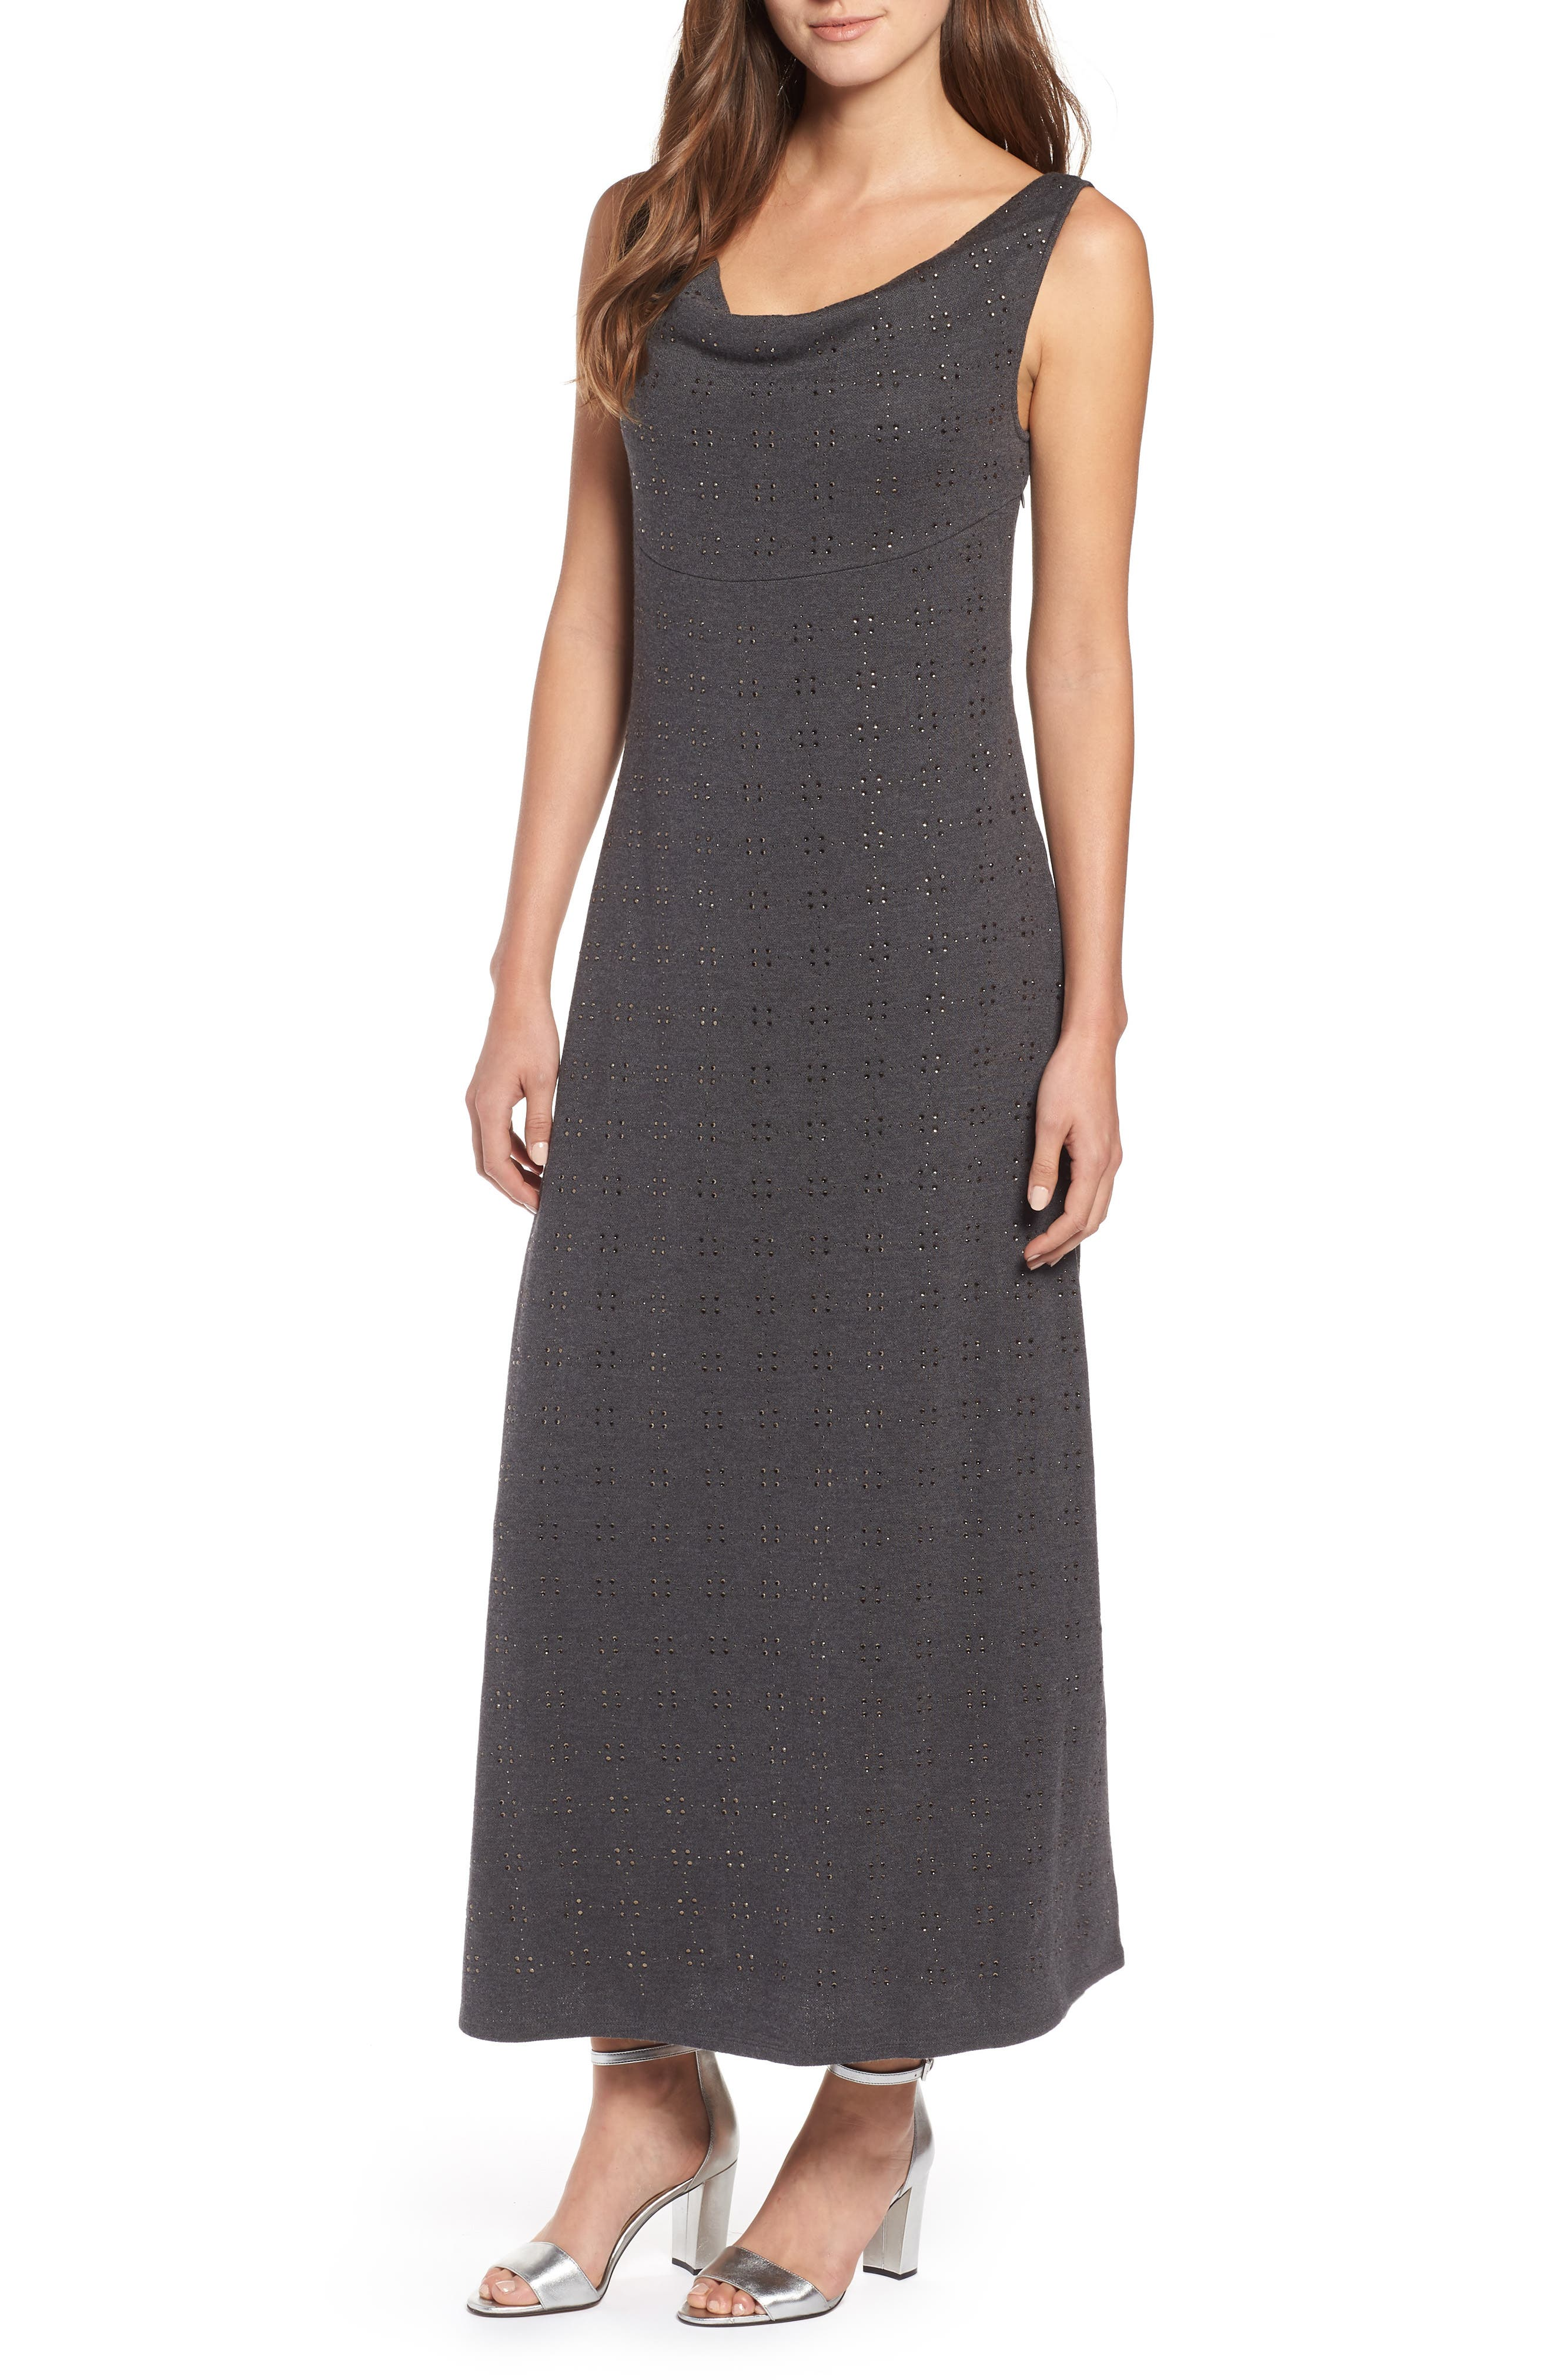 Subtle Shine Dress,                             Main thumbnail 1, color,                             Multi